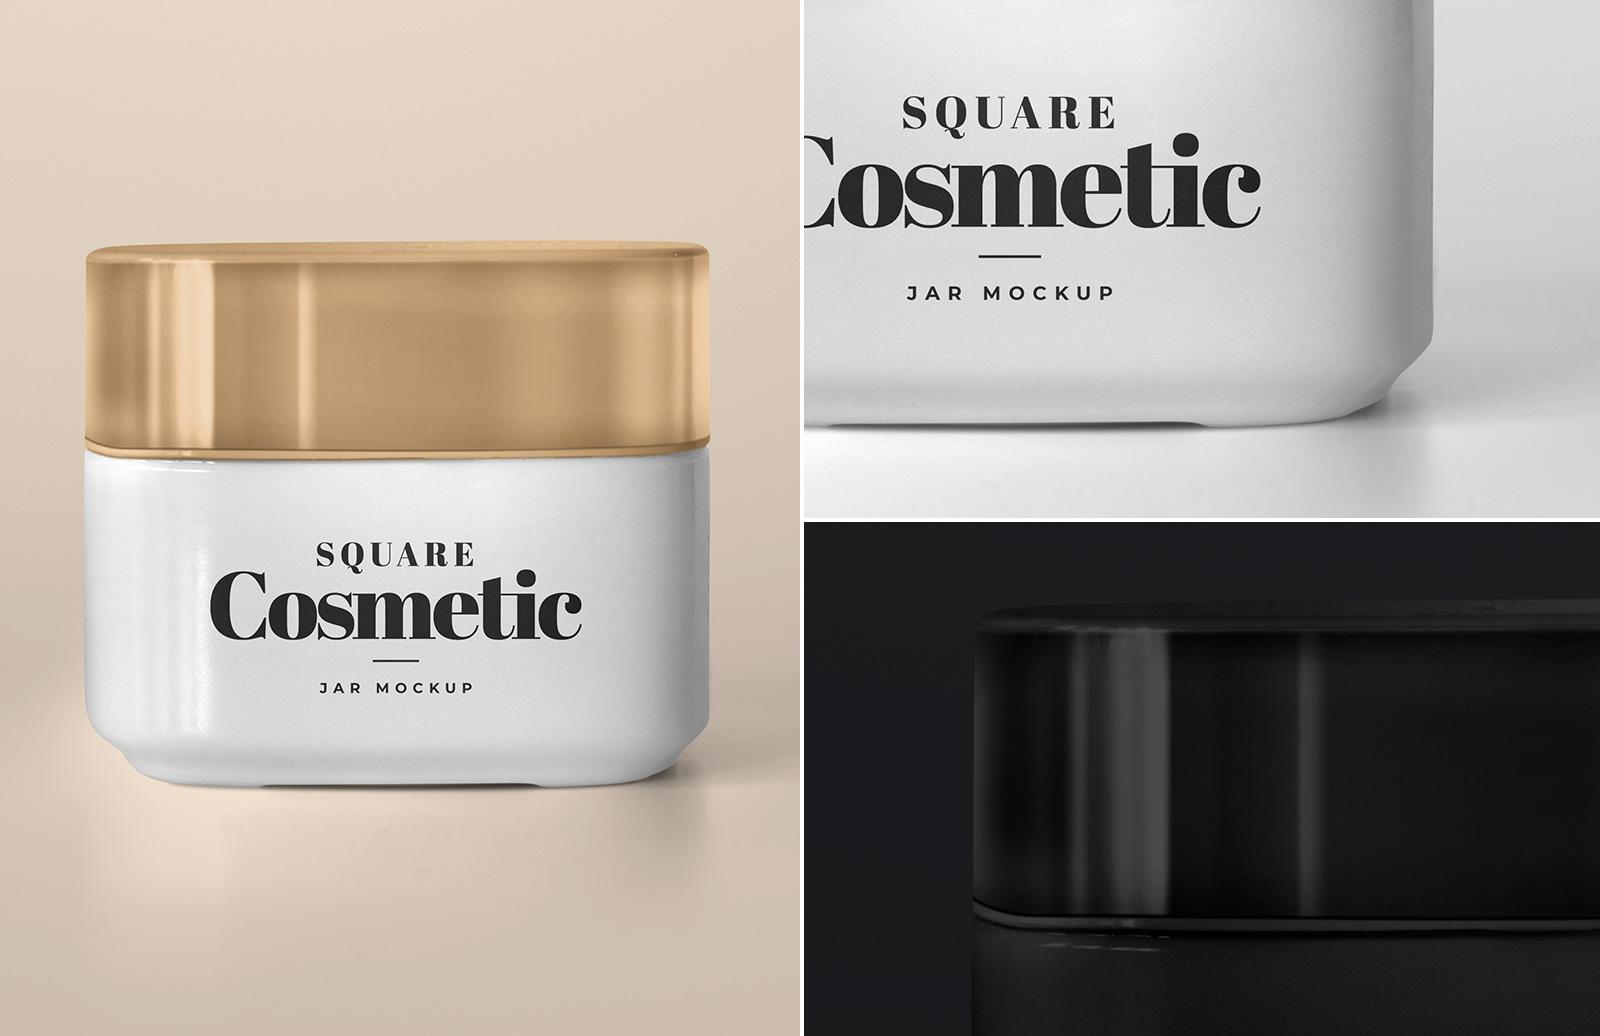 Square Cosmetic Jar Mockup Preview 1